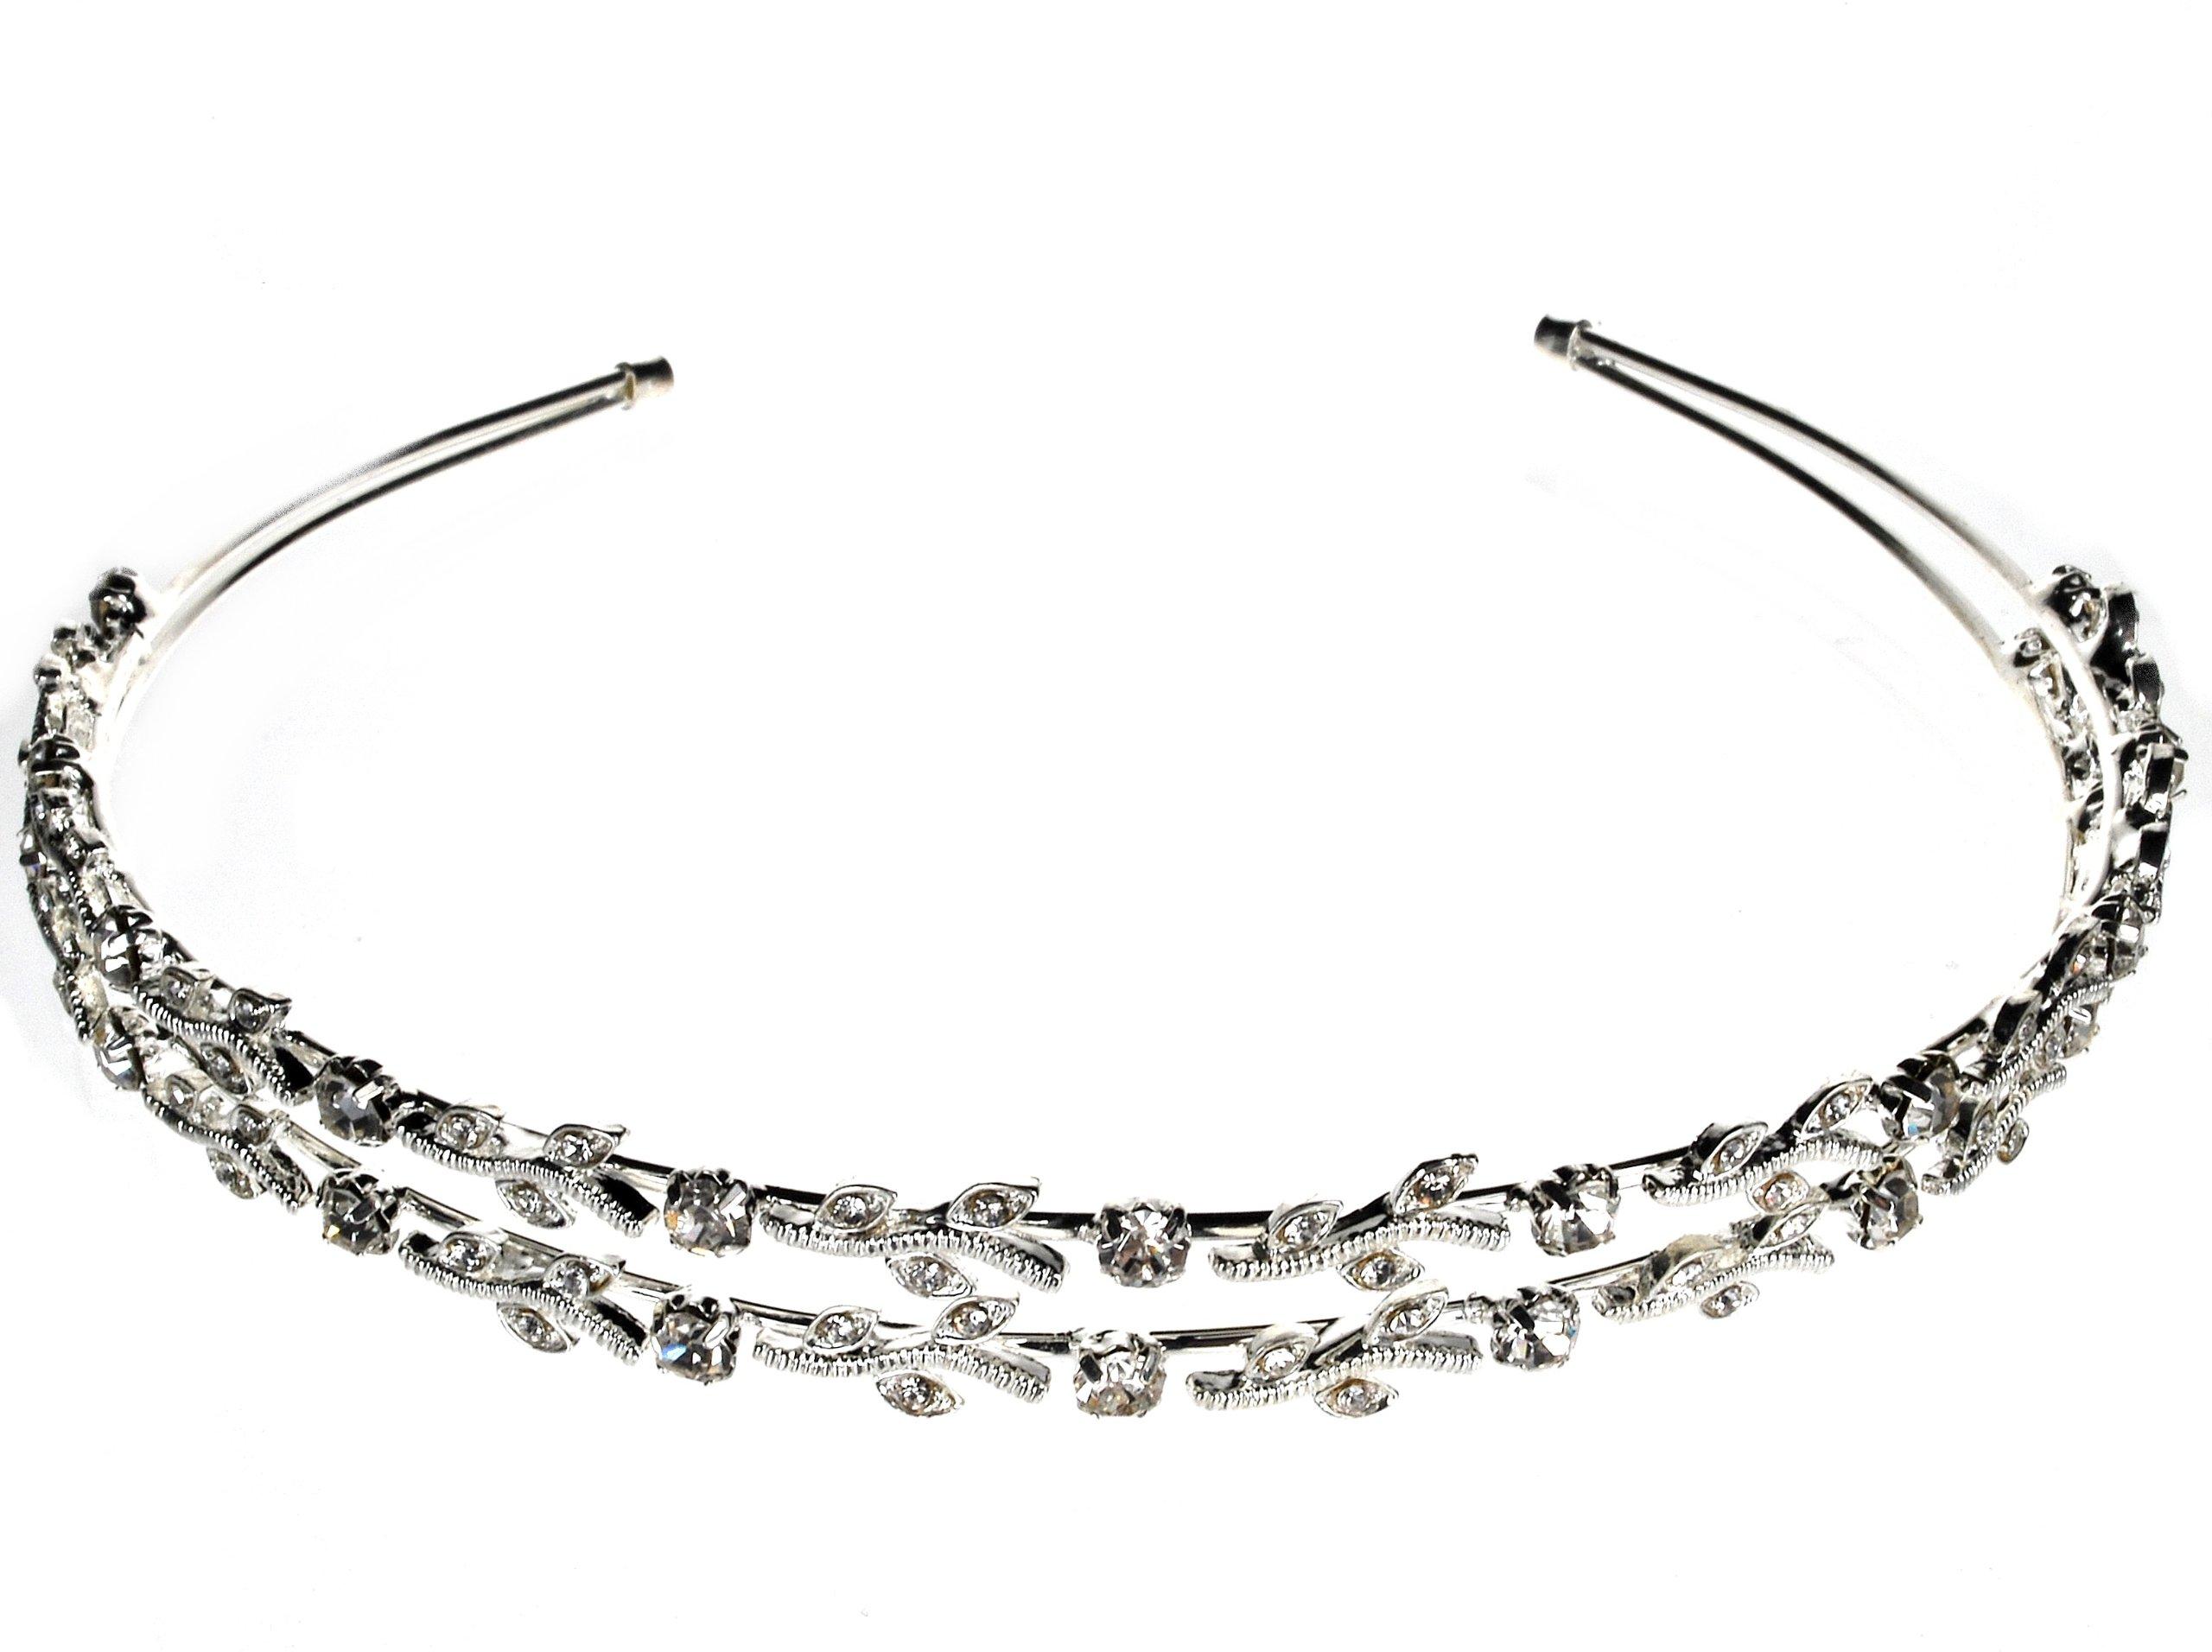 SC Bridal Wedding Tiara Crown Double Headband With Leaves C5347